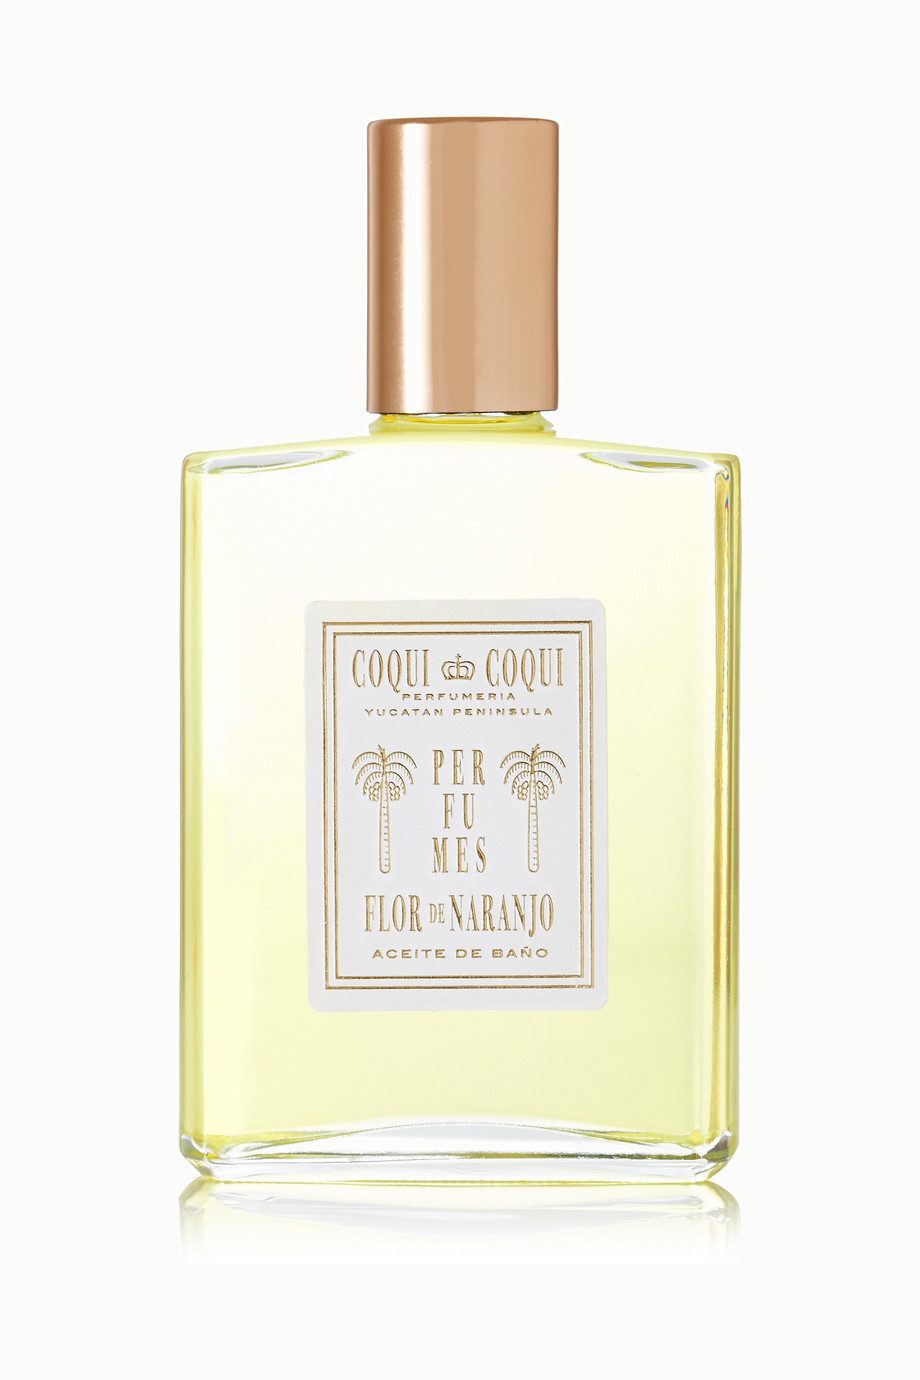 Orange Blossom Bath Oil, 100ml, by Coqui Coqui